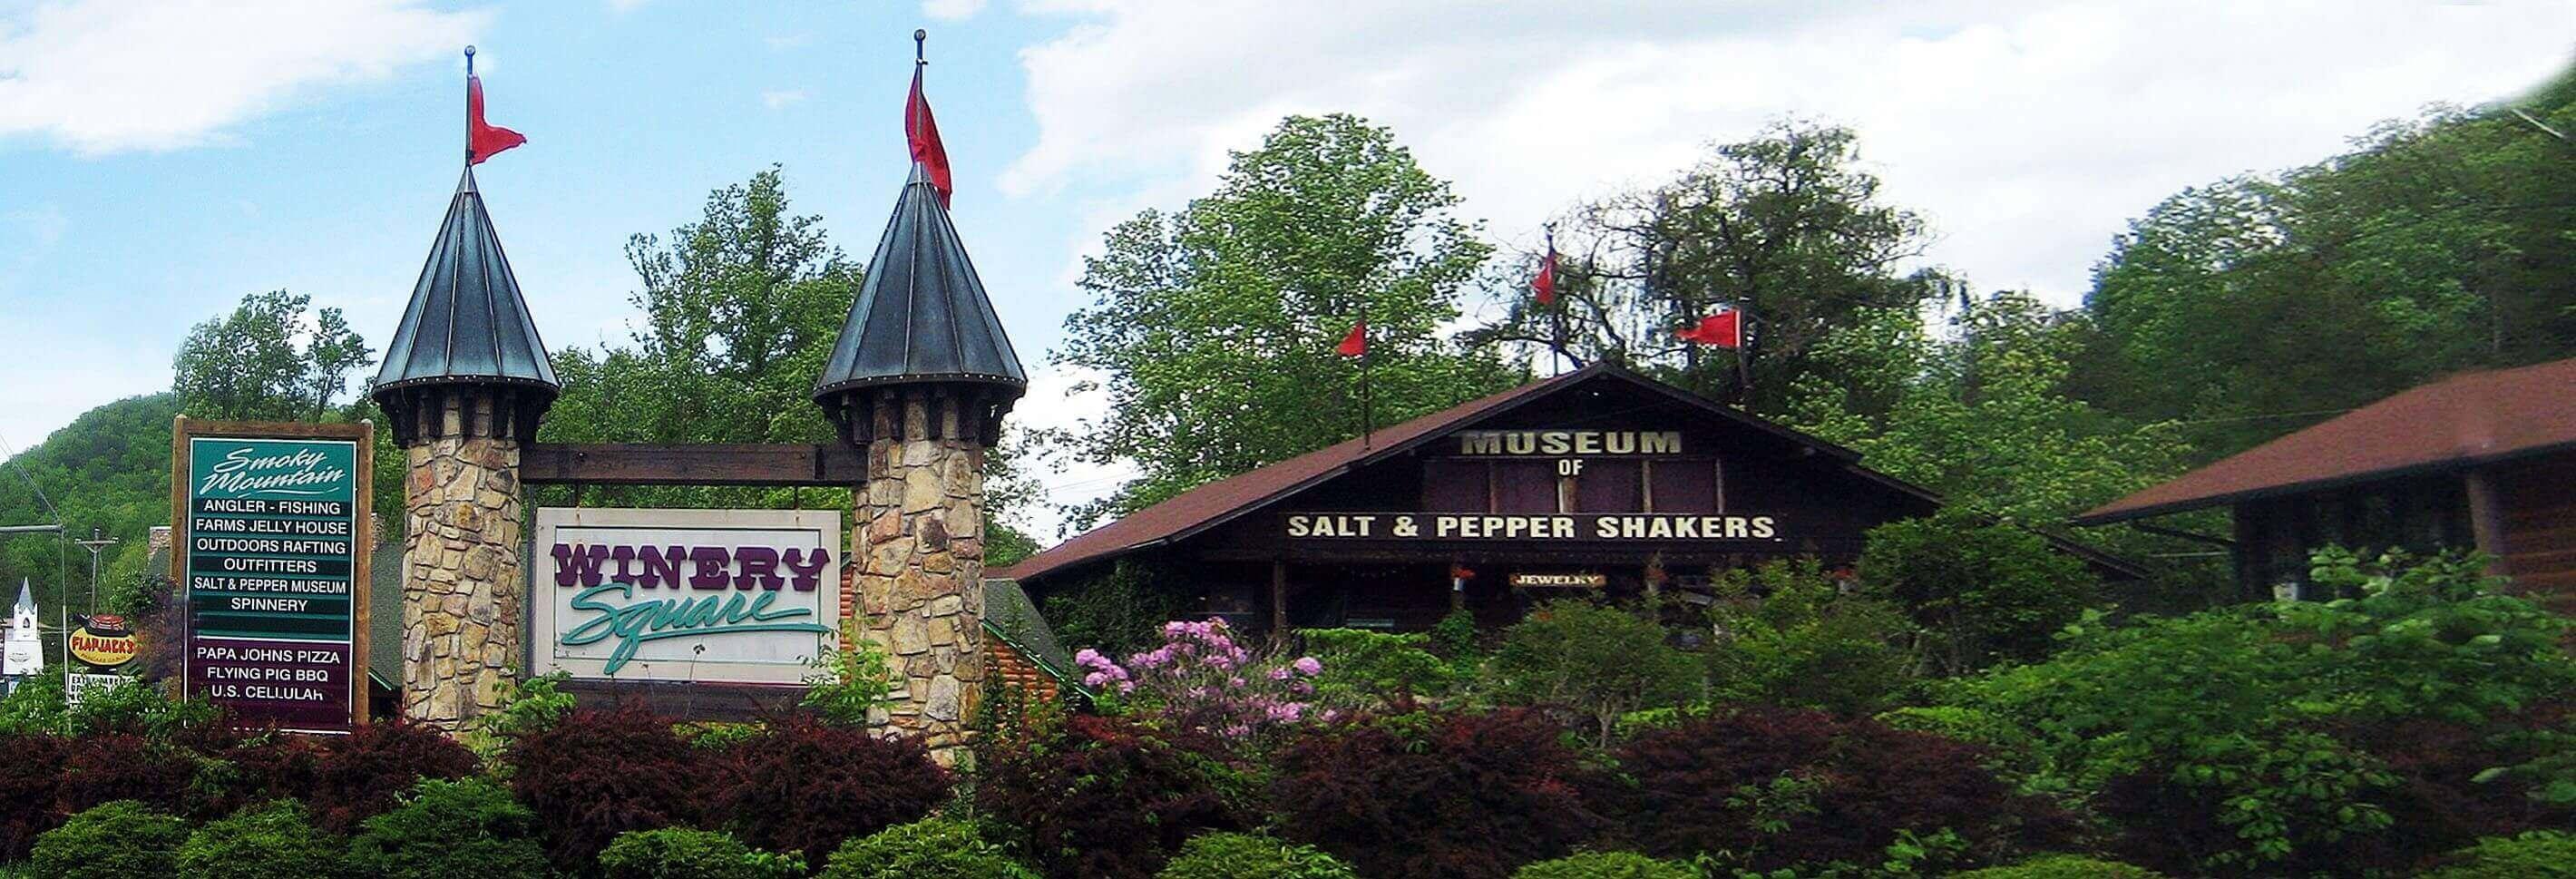 salt-pepper-museum-gatlinburg